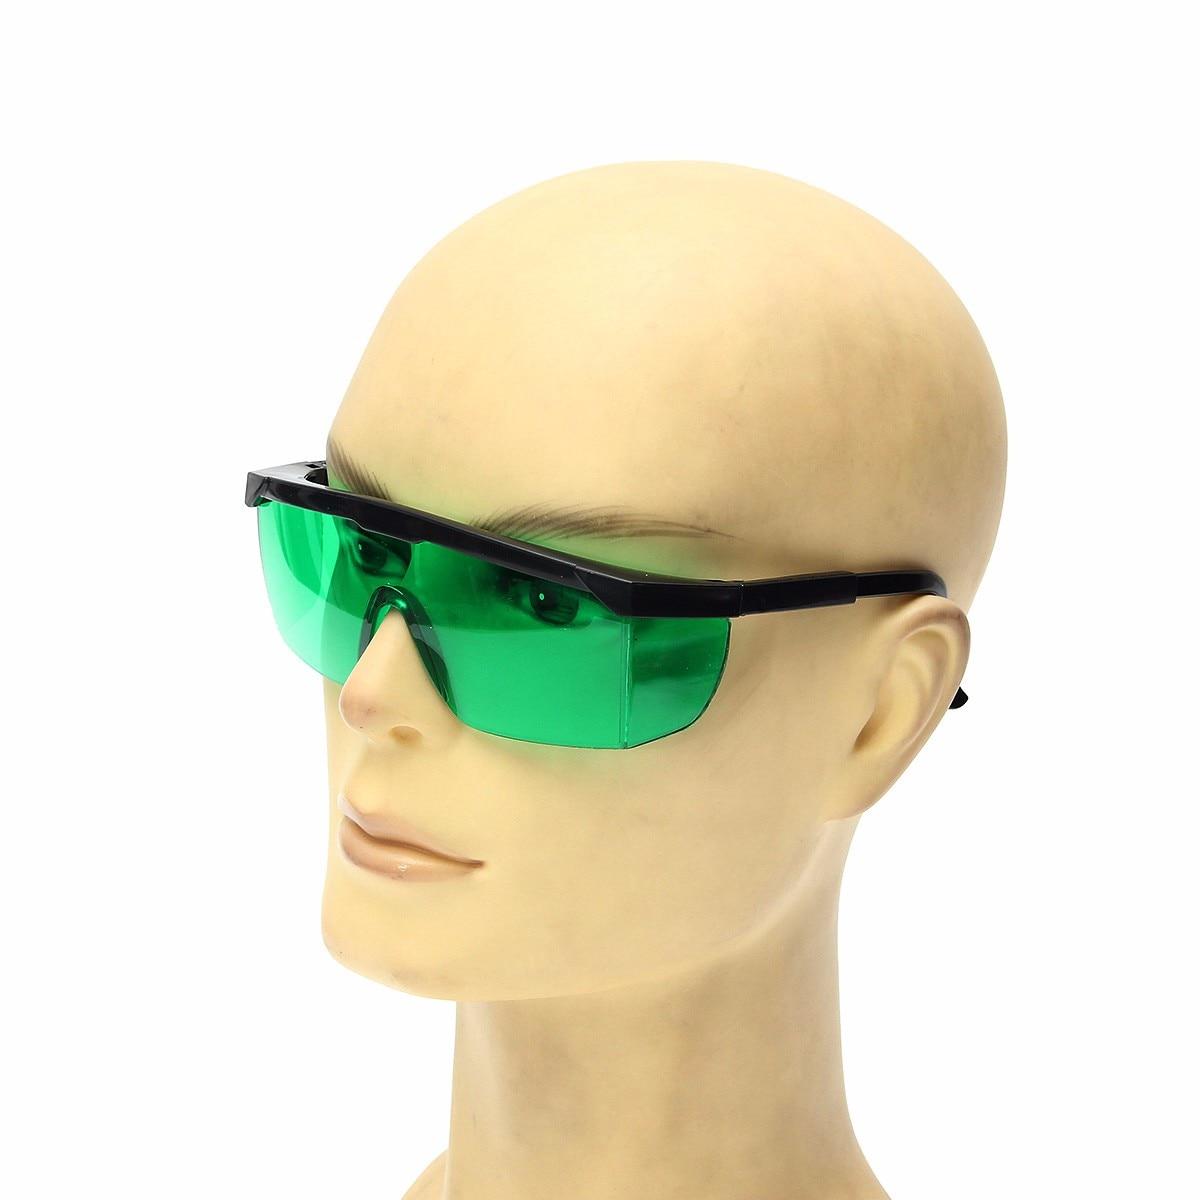 200-540nm Blue 808NM 980NM Laser Protection Glasses IR Laser Protection Glasses Goggles OD4+ For Laser Engraving Machine